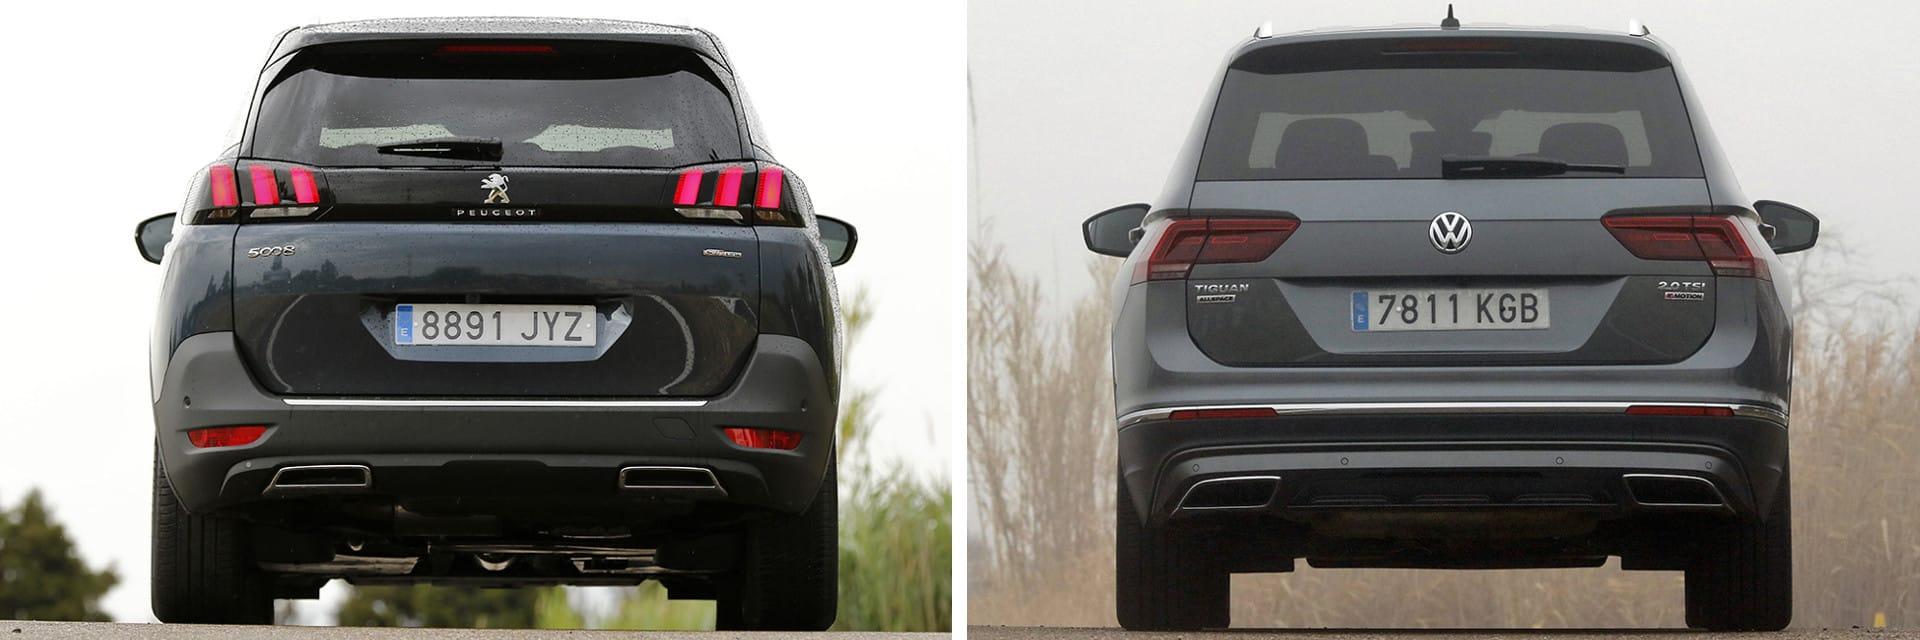 La altura al borde de carga del Peugeot (Izq.) está 4 cm más baja que en el Volkswagen (73 cm)